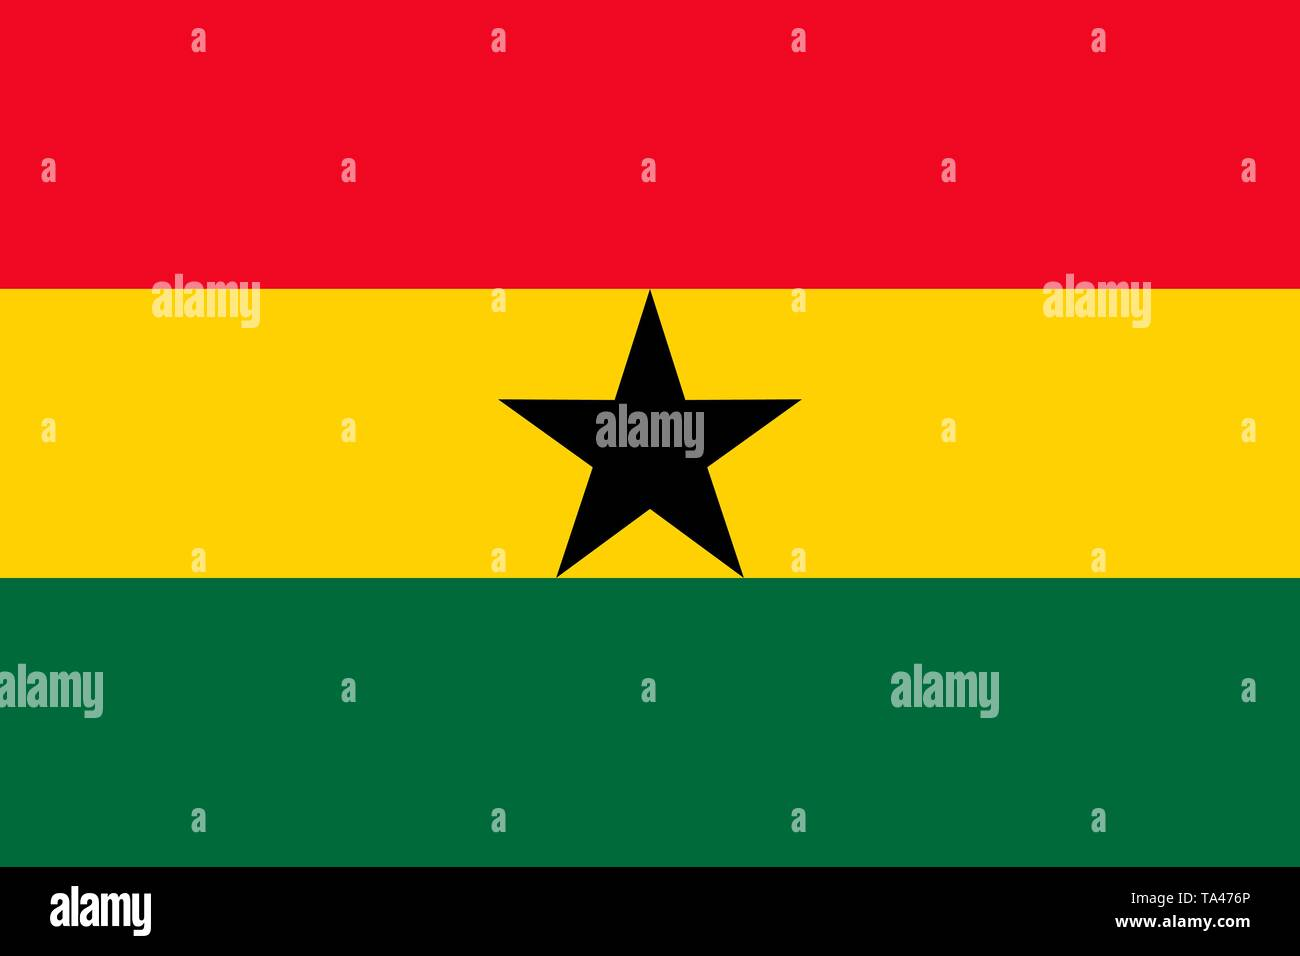 The national flag of Ghana. Vector illustration. Accra - Stock Vector